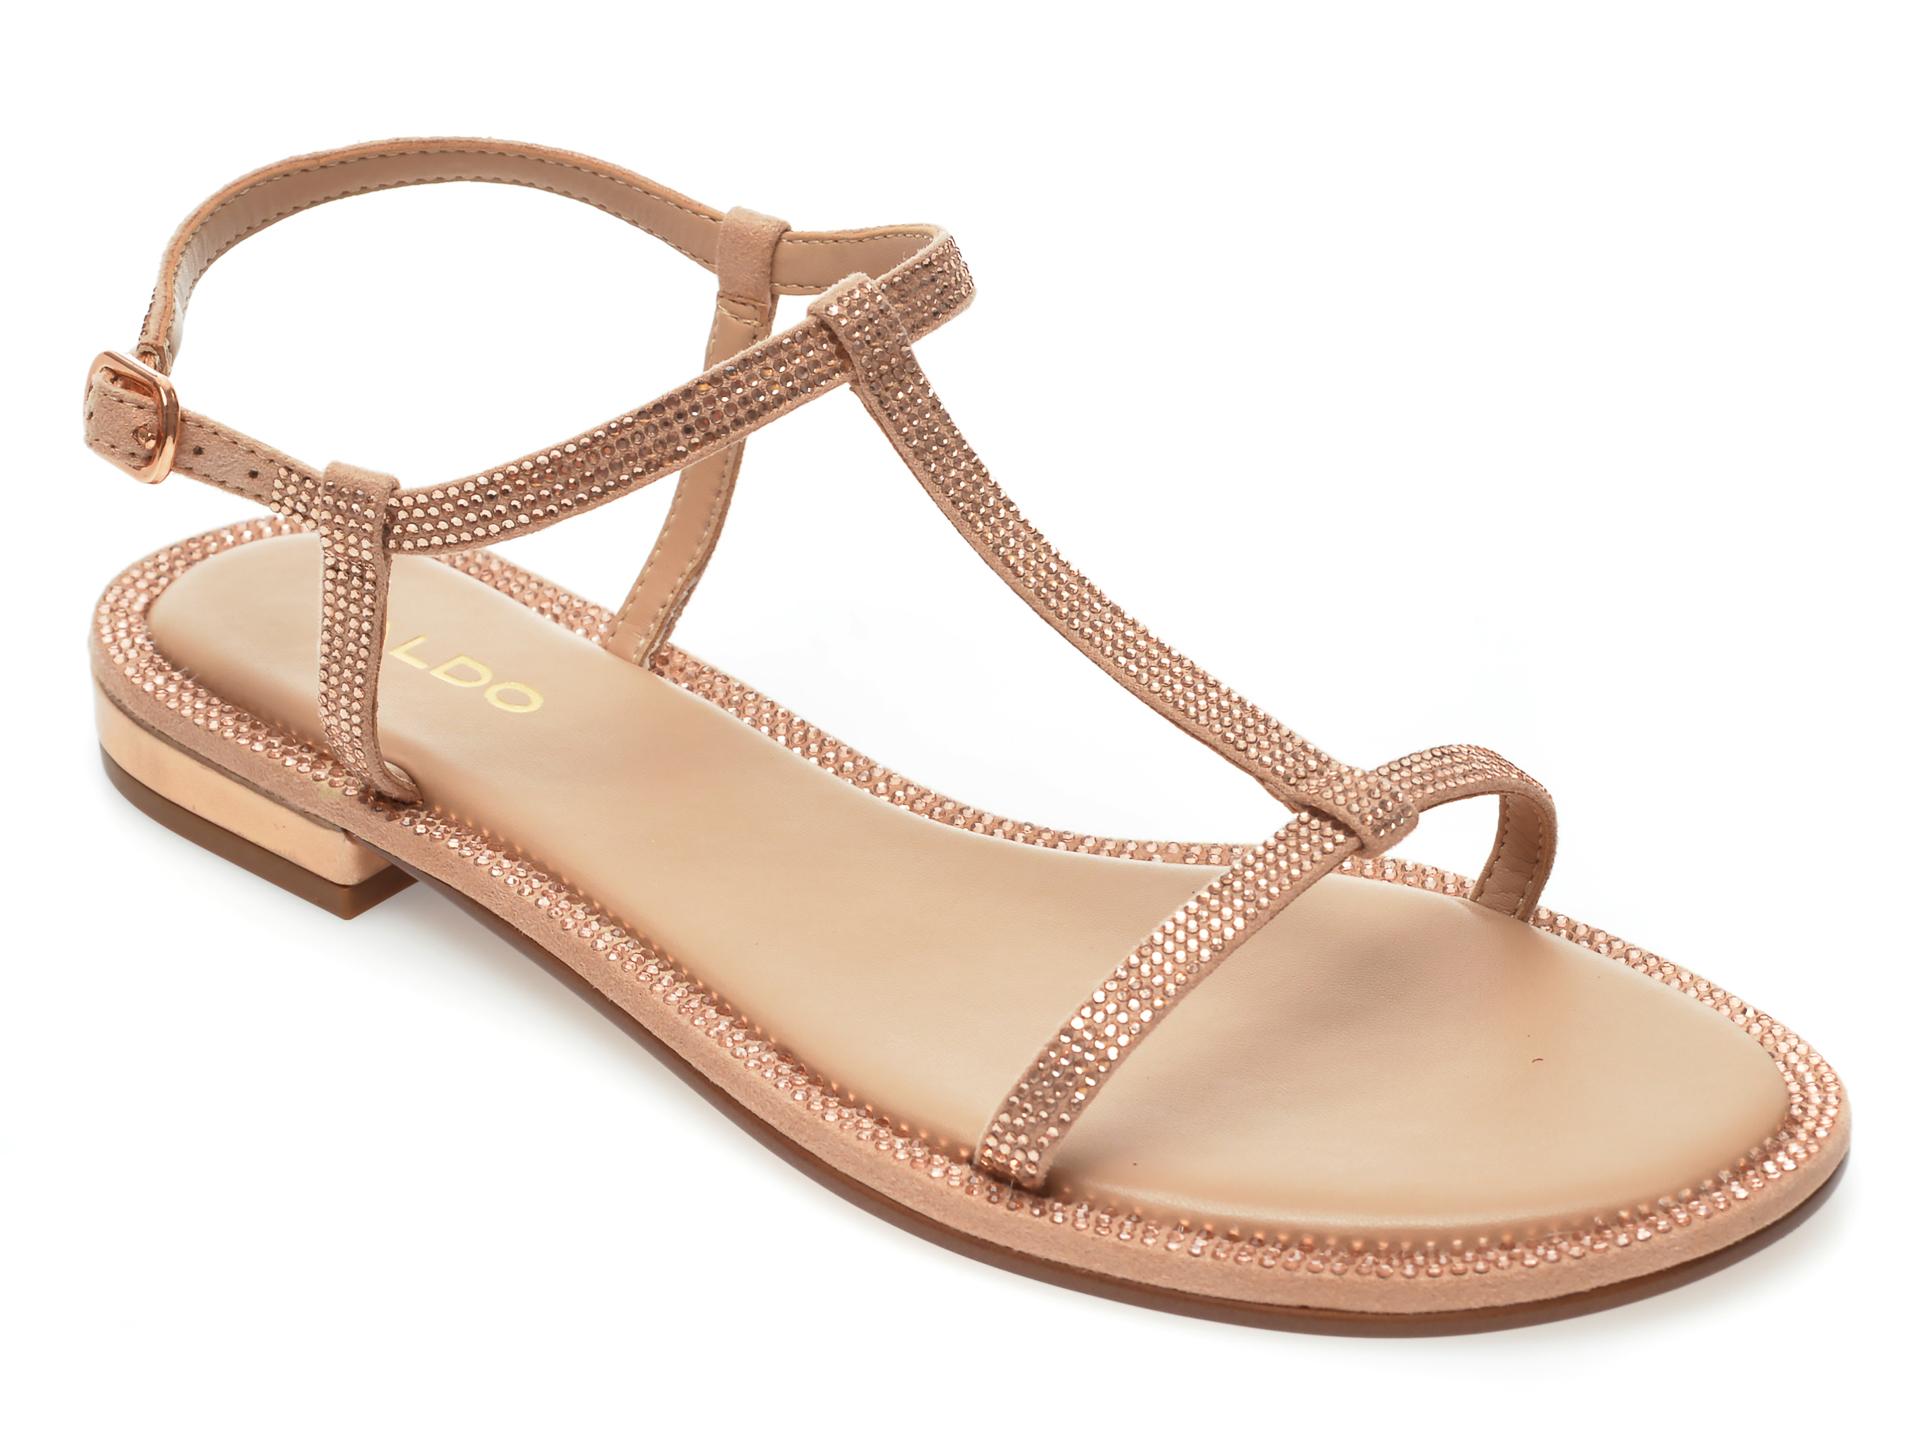 Sandale ALDO roz, Yboimma653, din material textil imagine otter.ro 2021